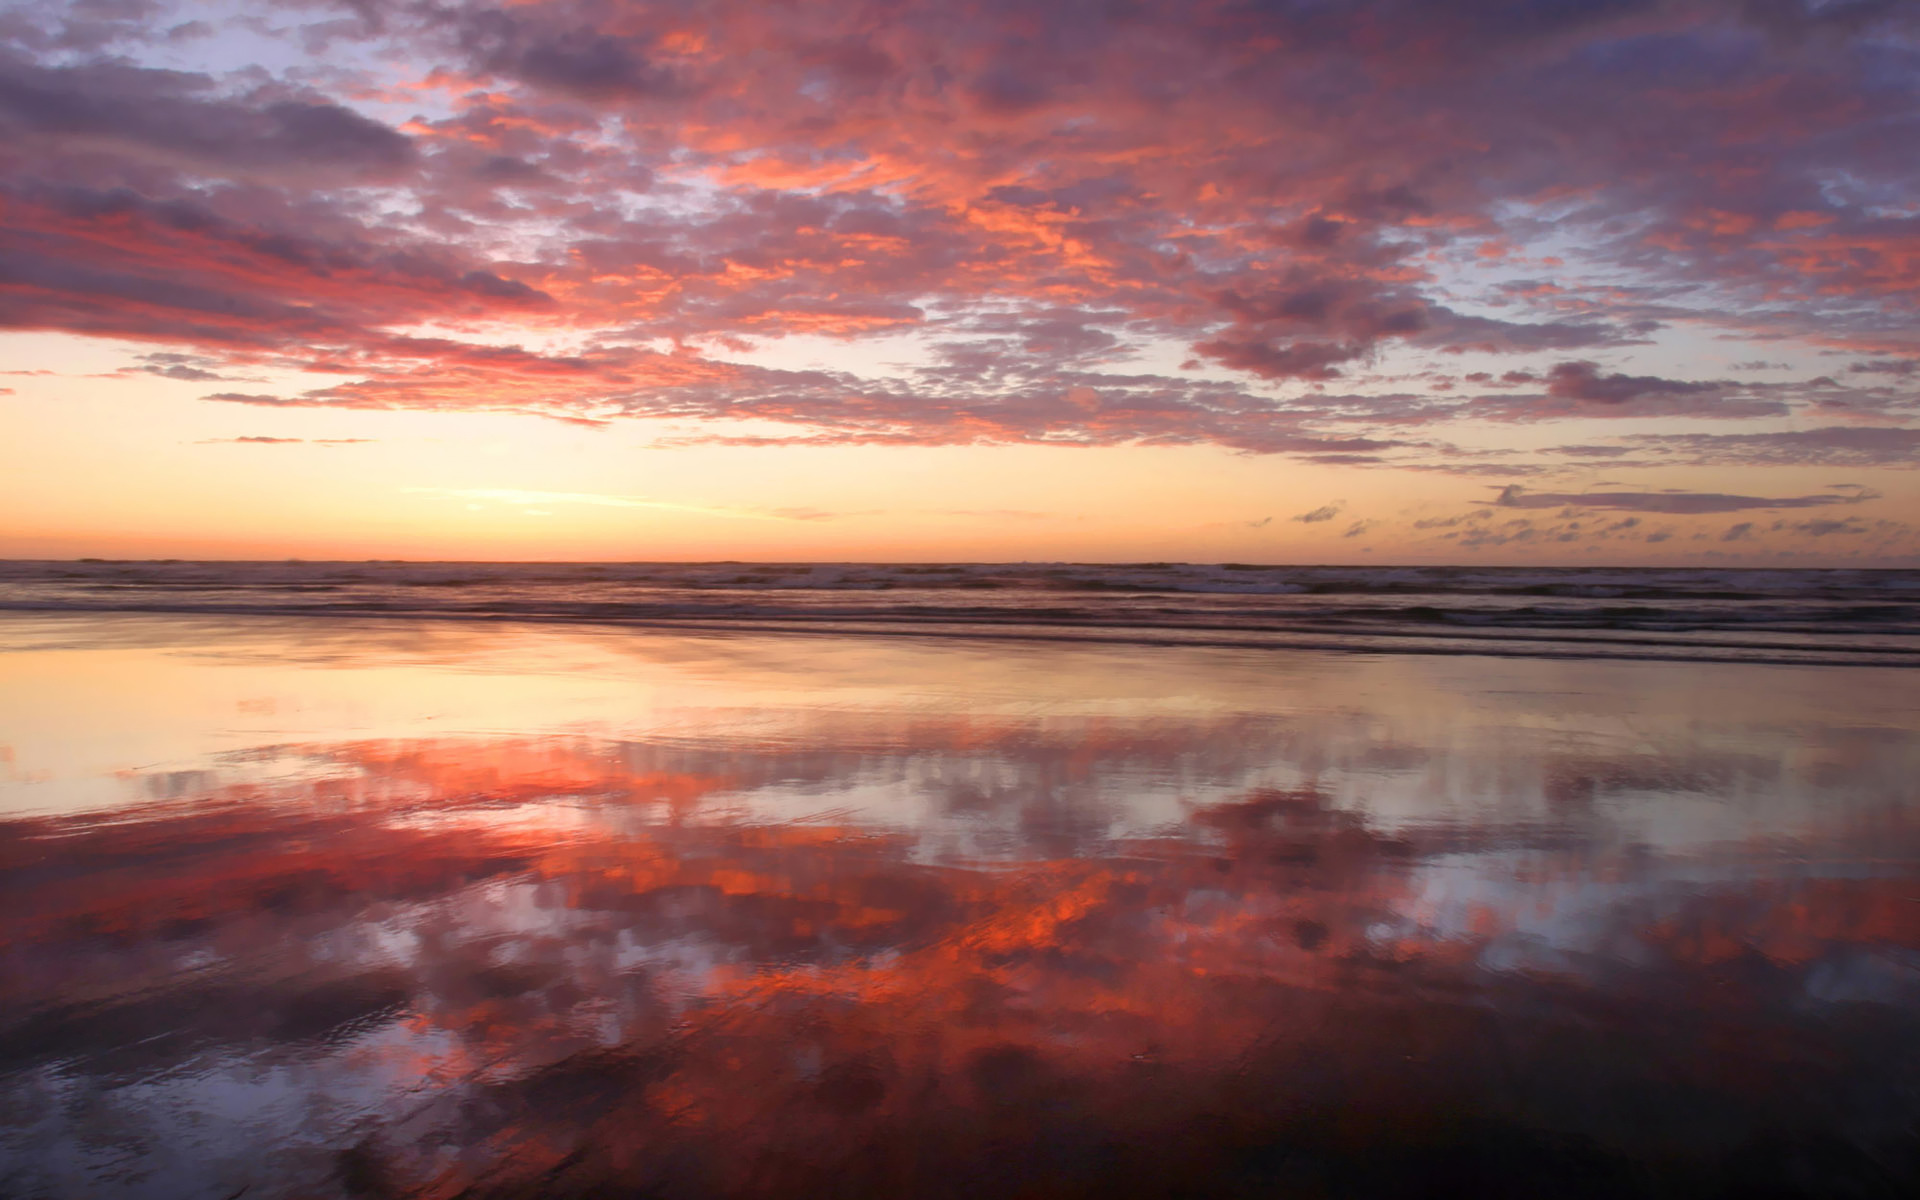 Ocean sunset wallpaper #2146